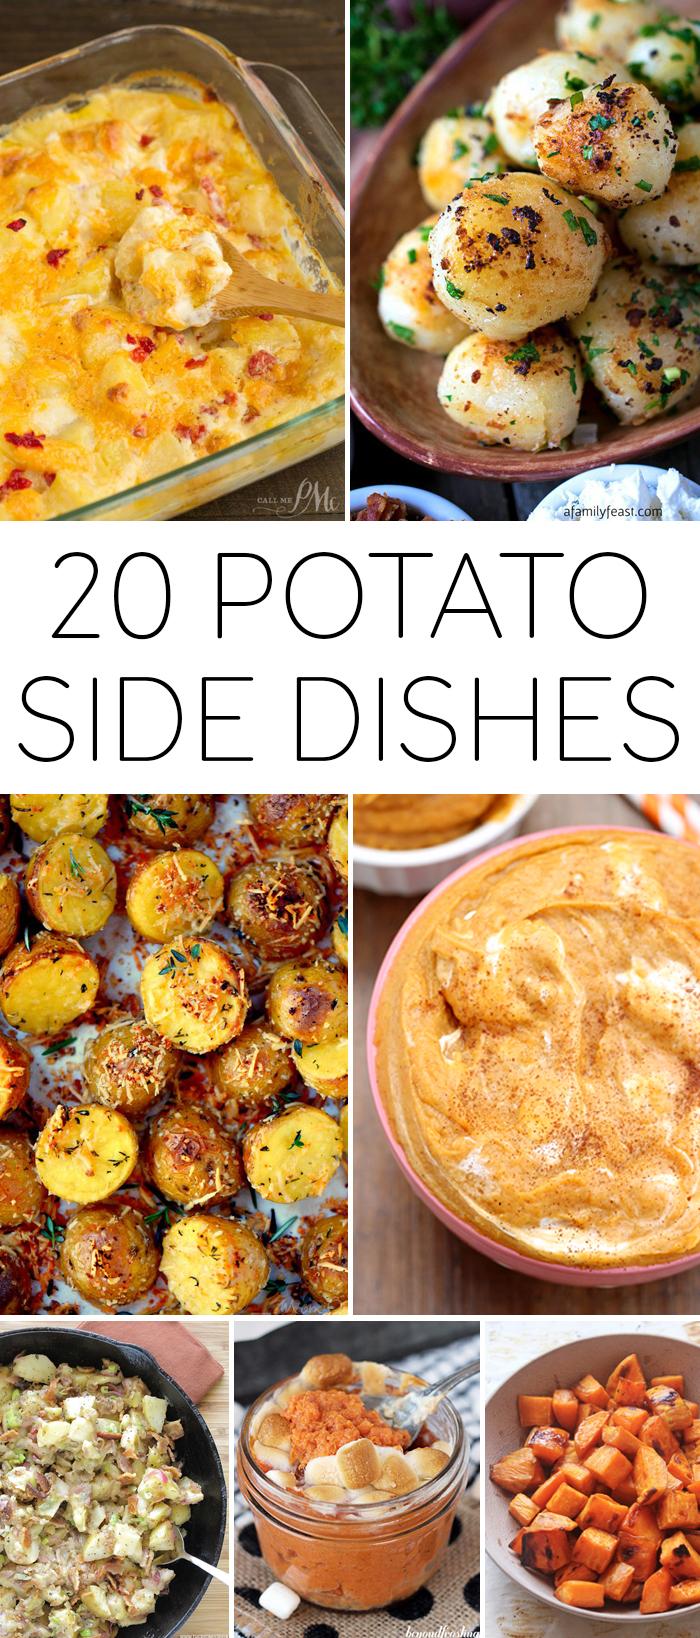 20 Potato Side Dishes